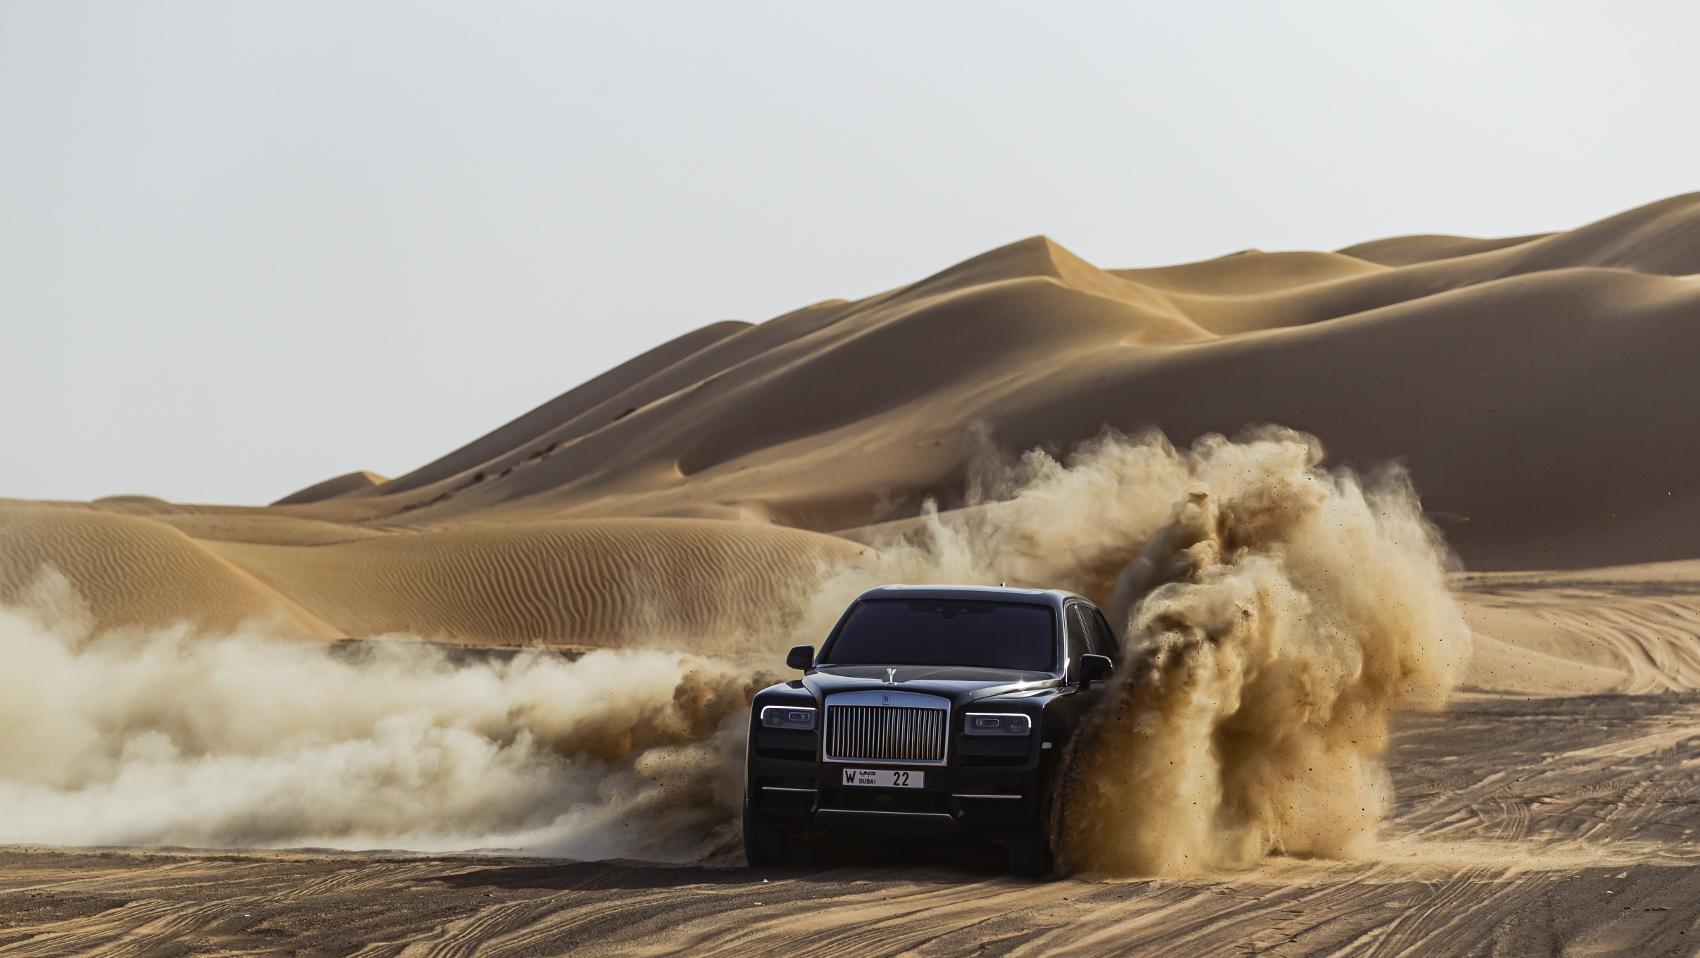 Rolls Royce Cullinan sa predviedol na púšti. Pozrite si foto aj video qOmpTmshcA rolls-royce-cullina